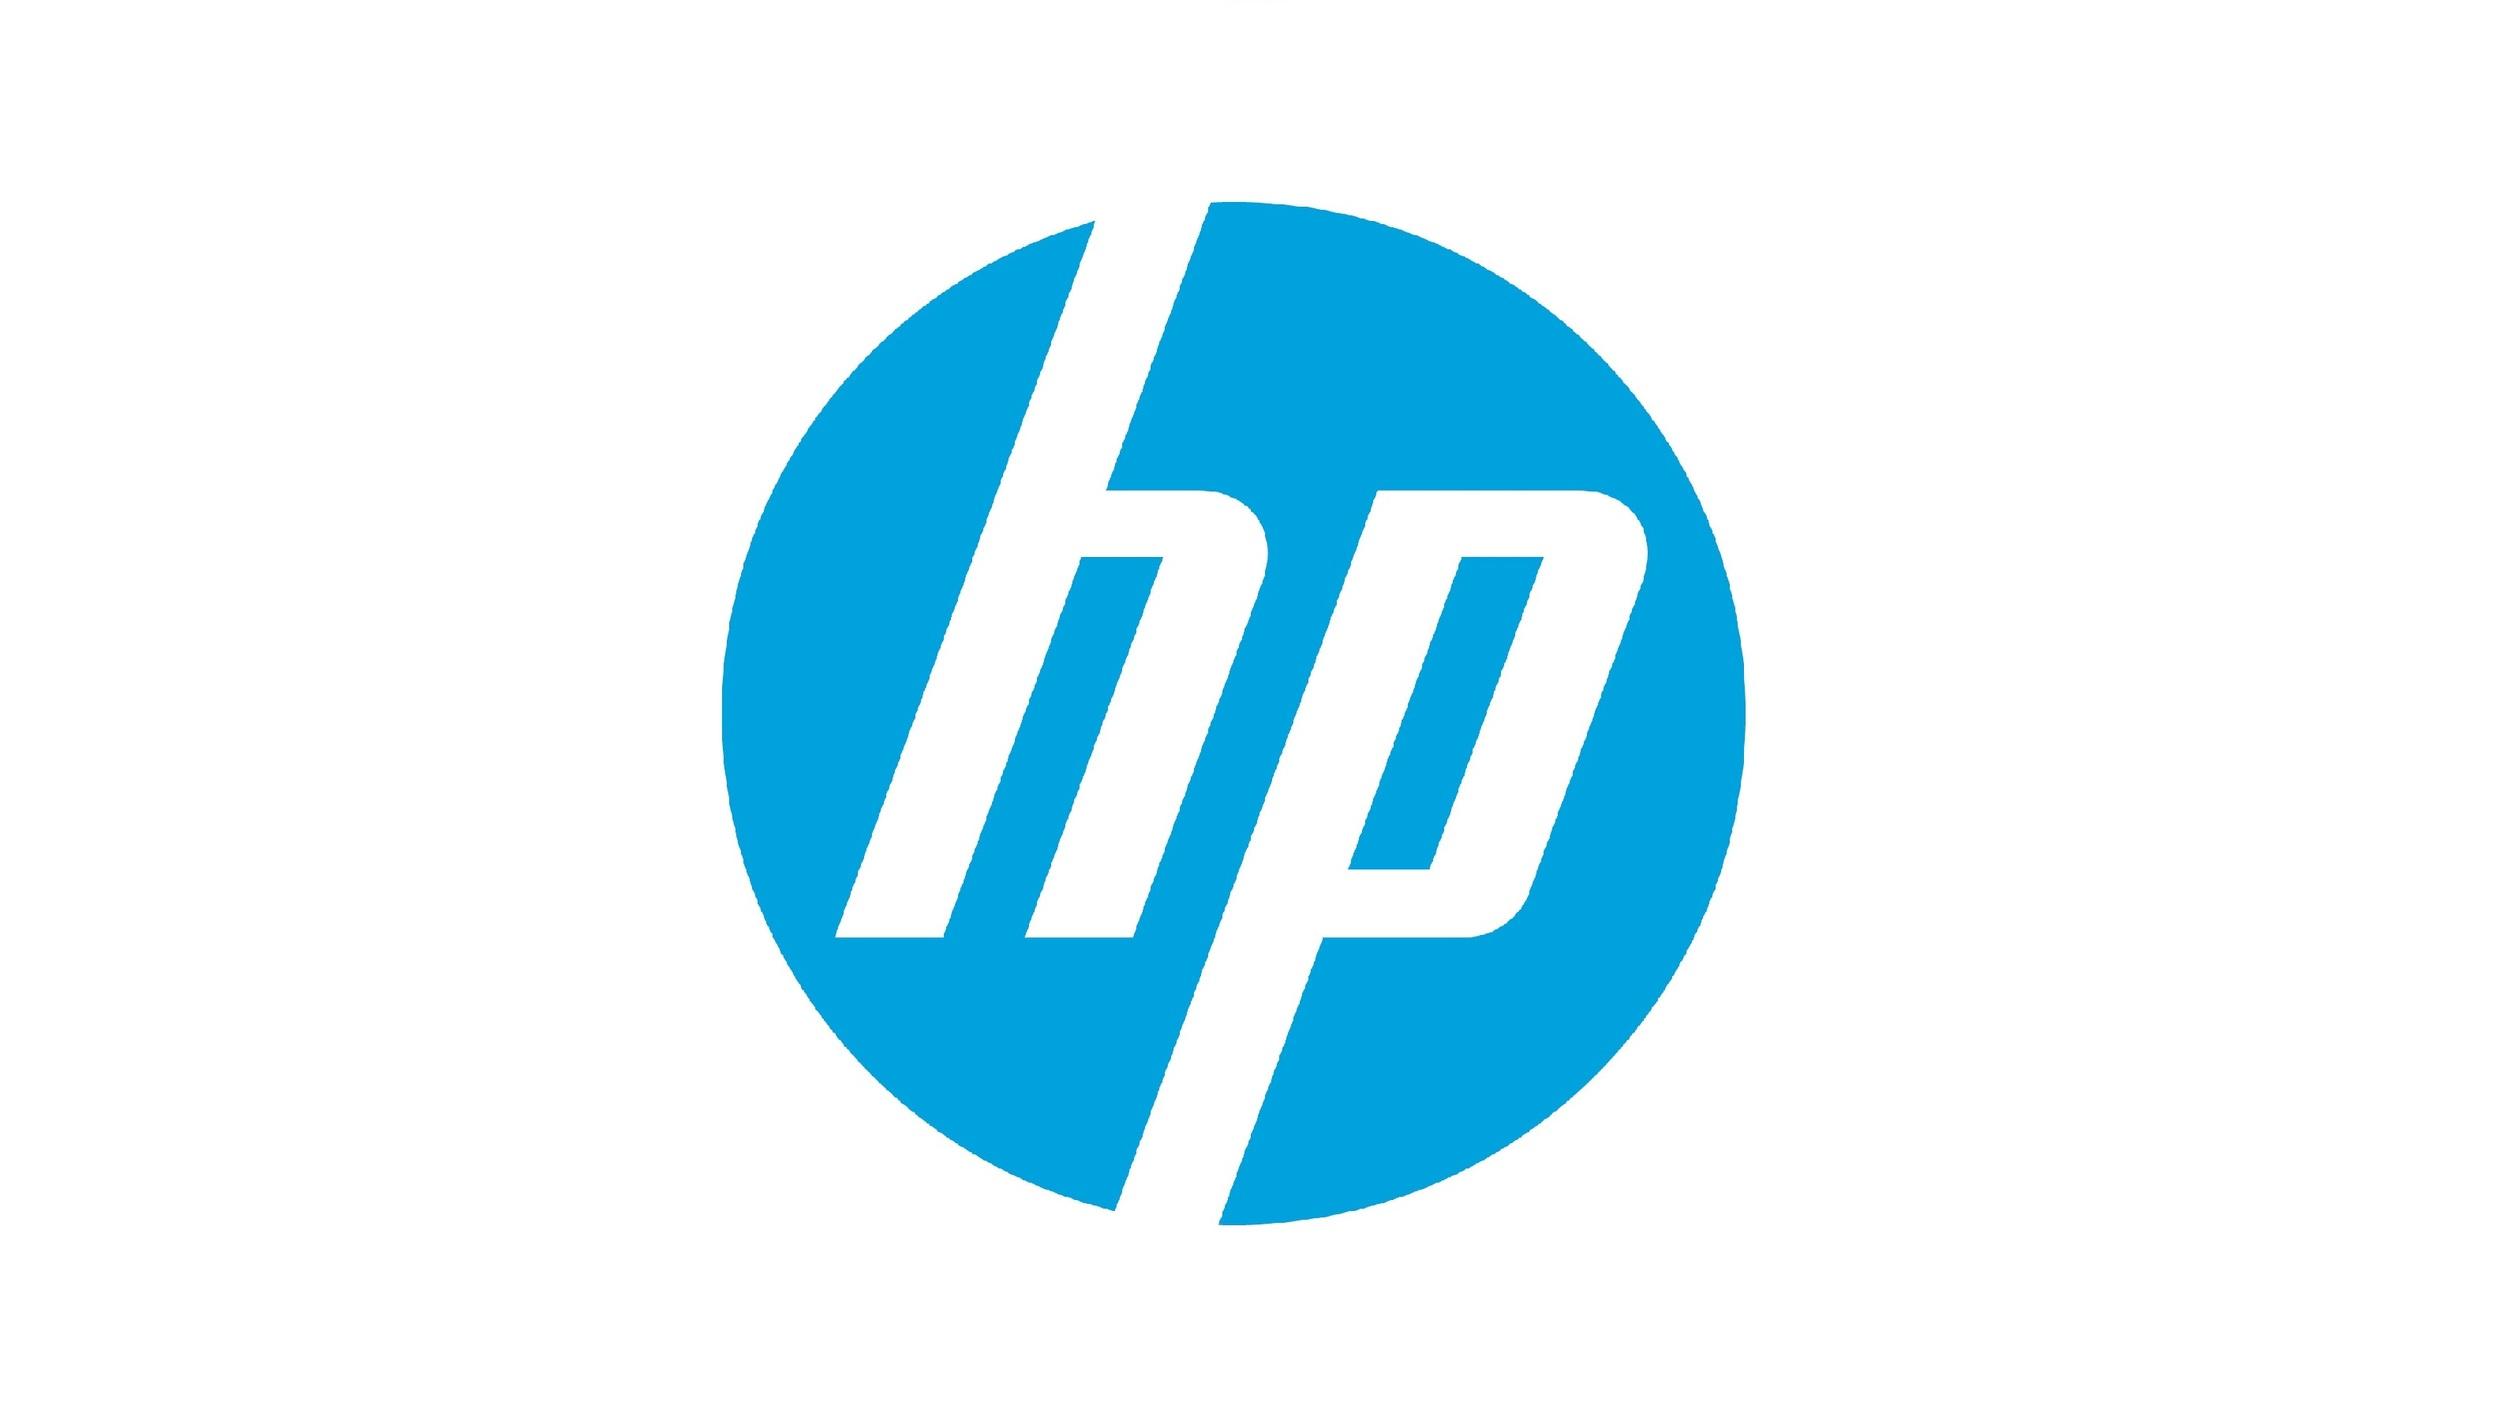 HPIncLogo.jpg